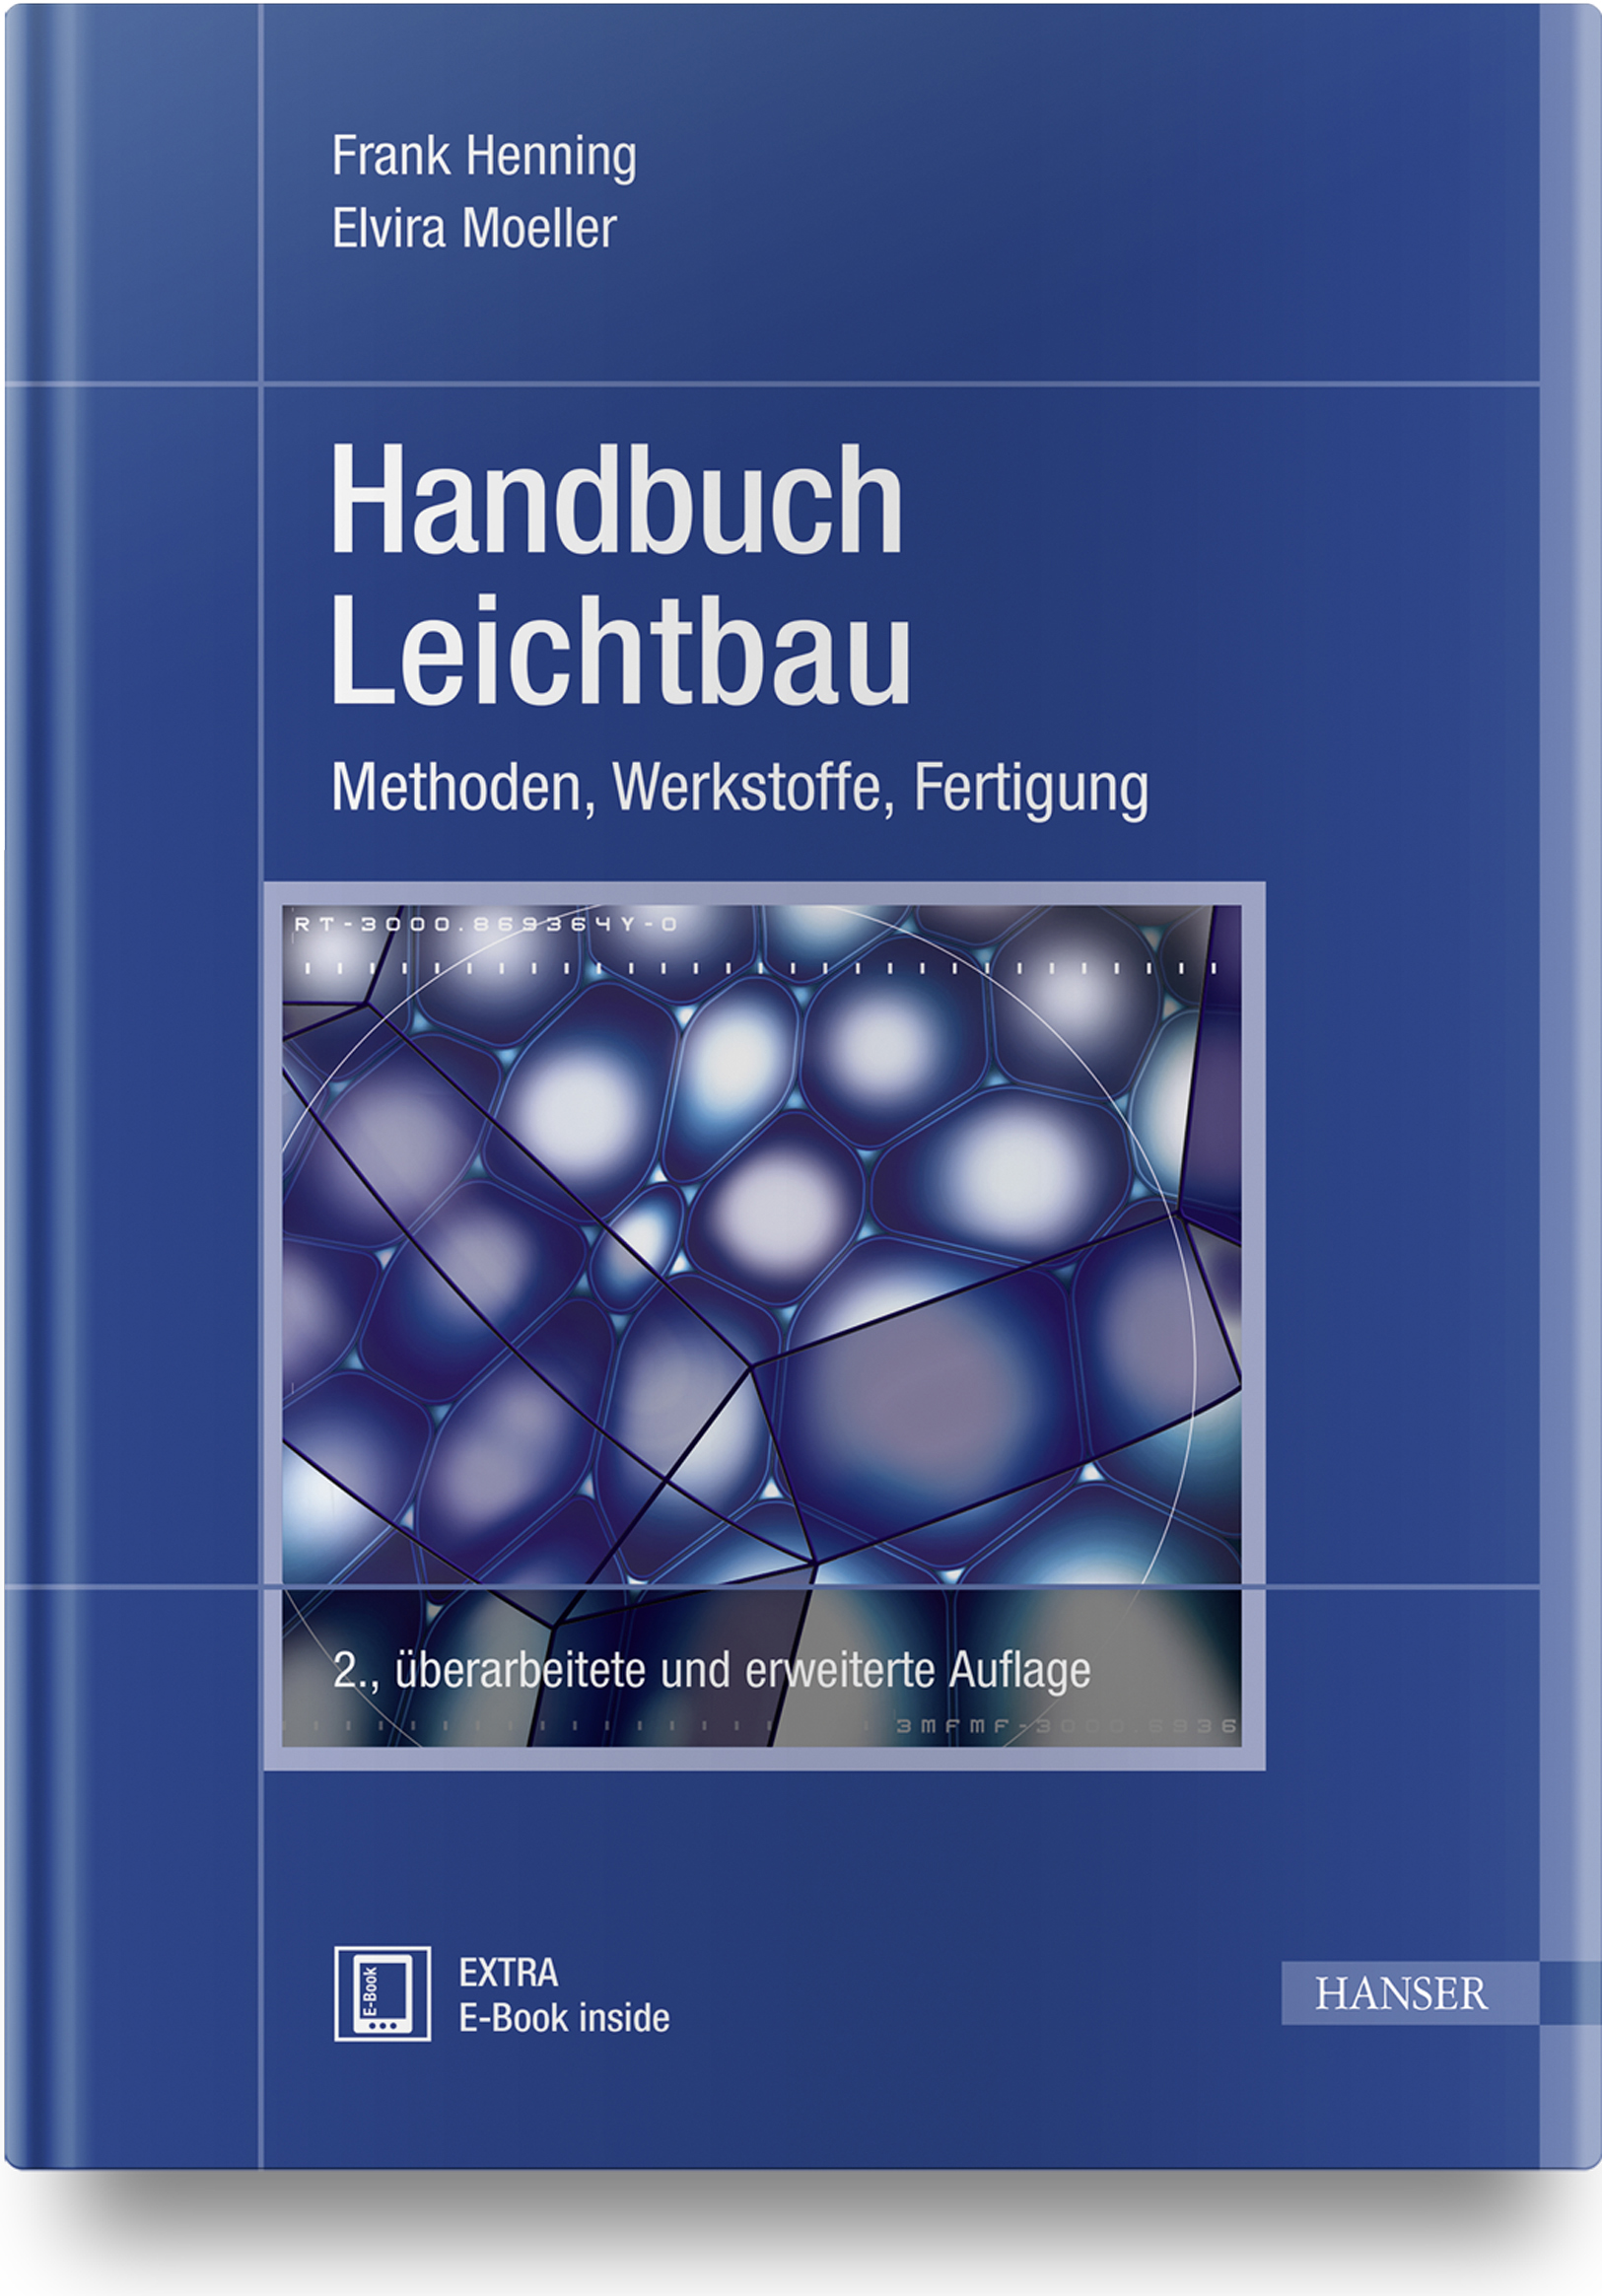 Handbuch Leichtbau, 978-3-446-45638-9